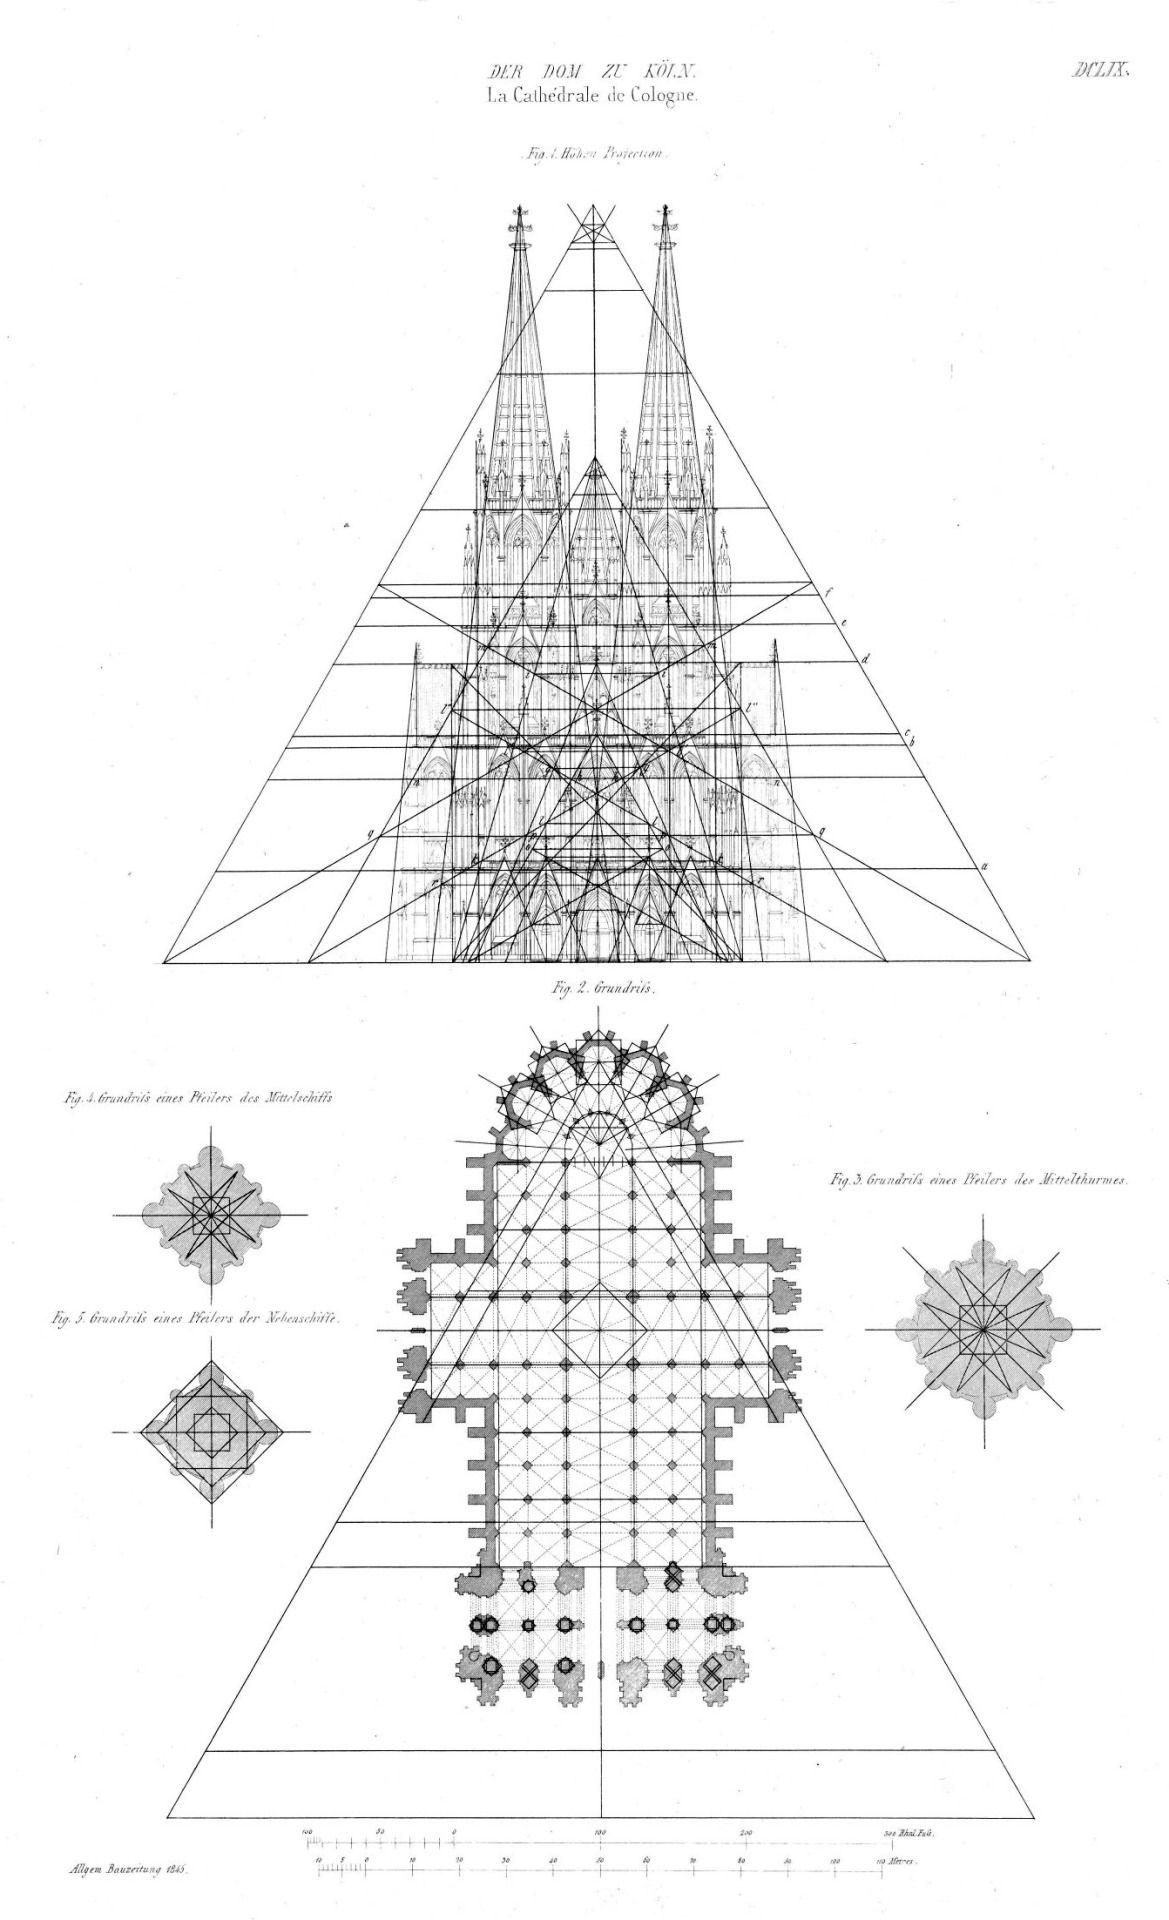 Archimaps Gothic Architecture DrawingReligious ArchitectureArchitecture BlueprintsArchitecture DiagramsPaper